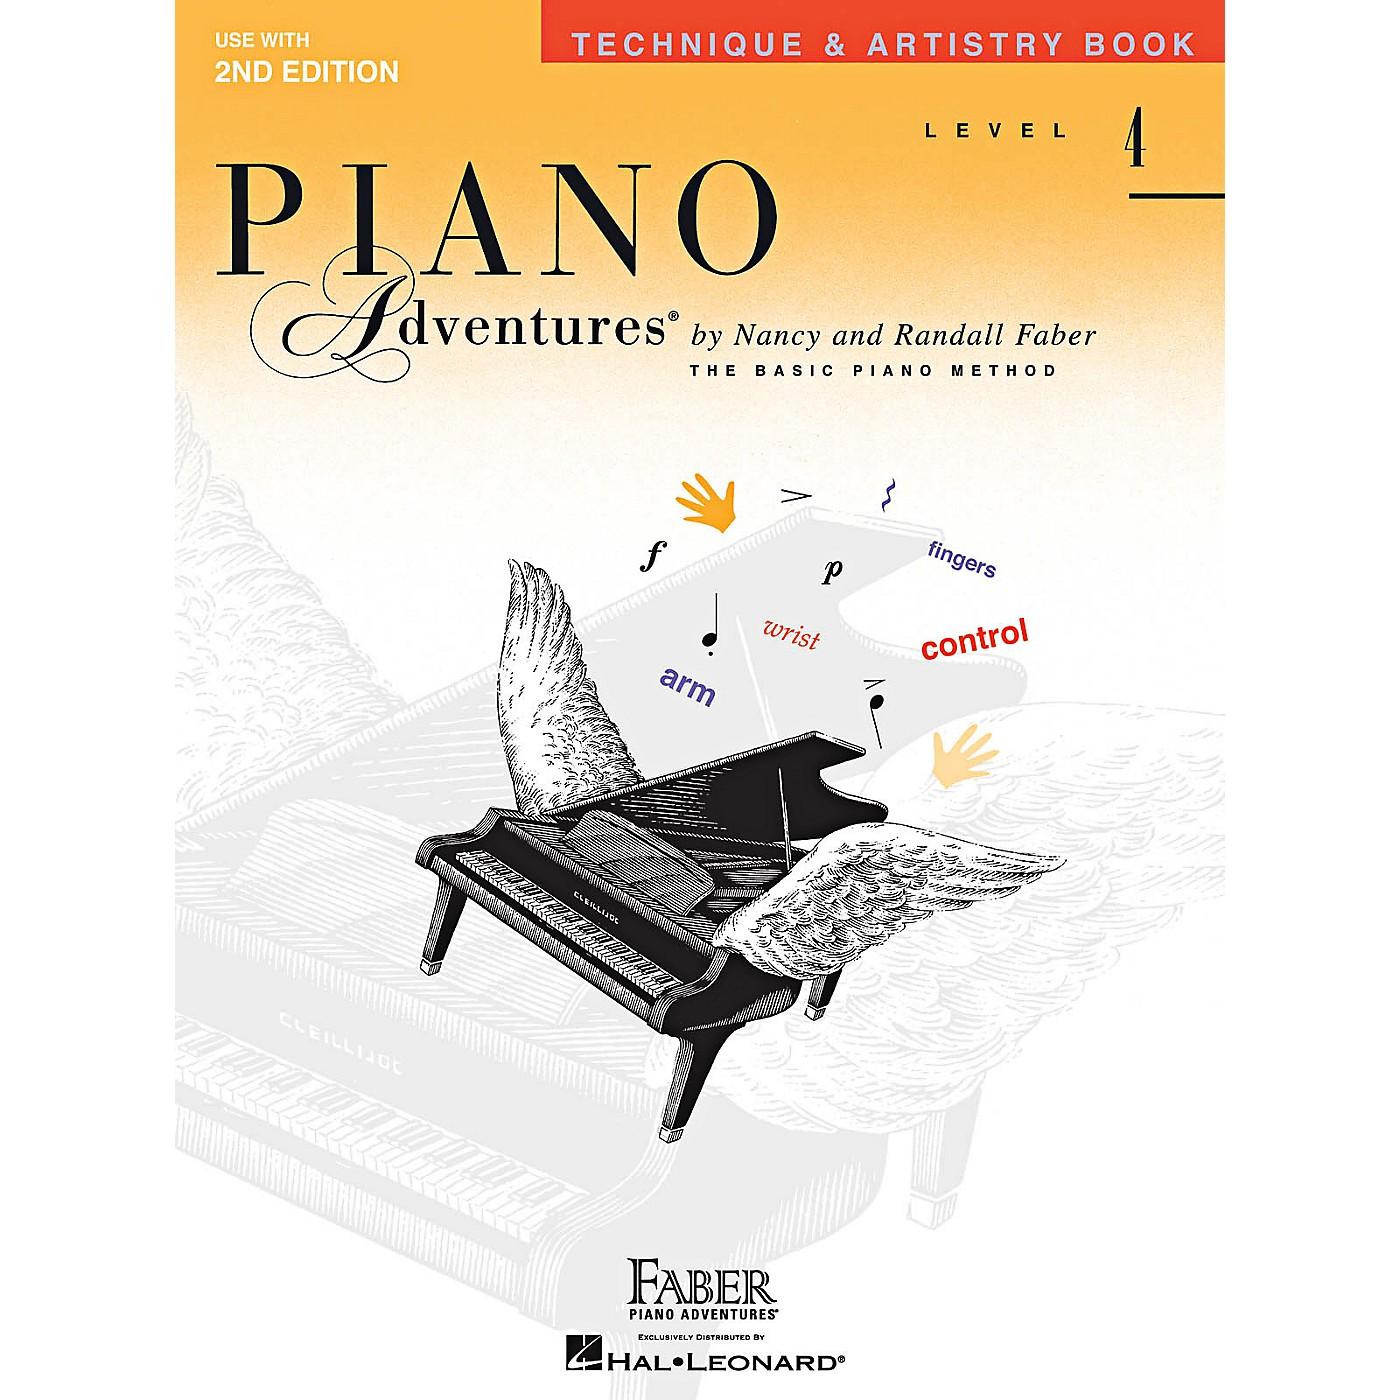 Faber Piano Adventures Technique & Artistry Level 4 Faber Piano Adventures Second Edition Book thumbnail